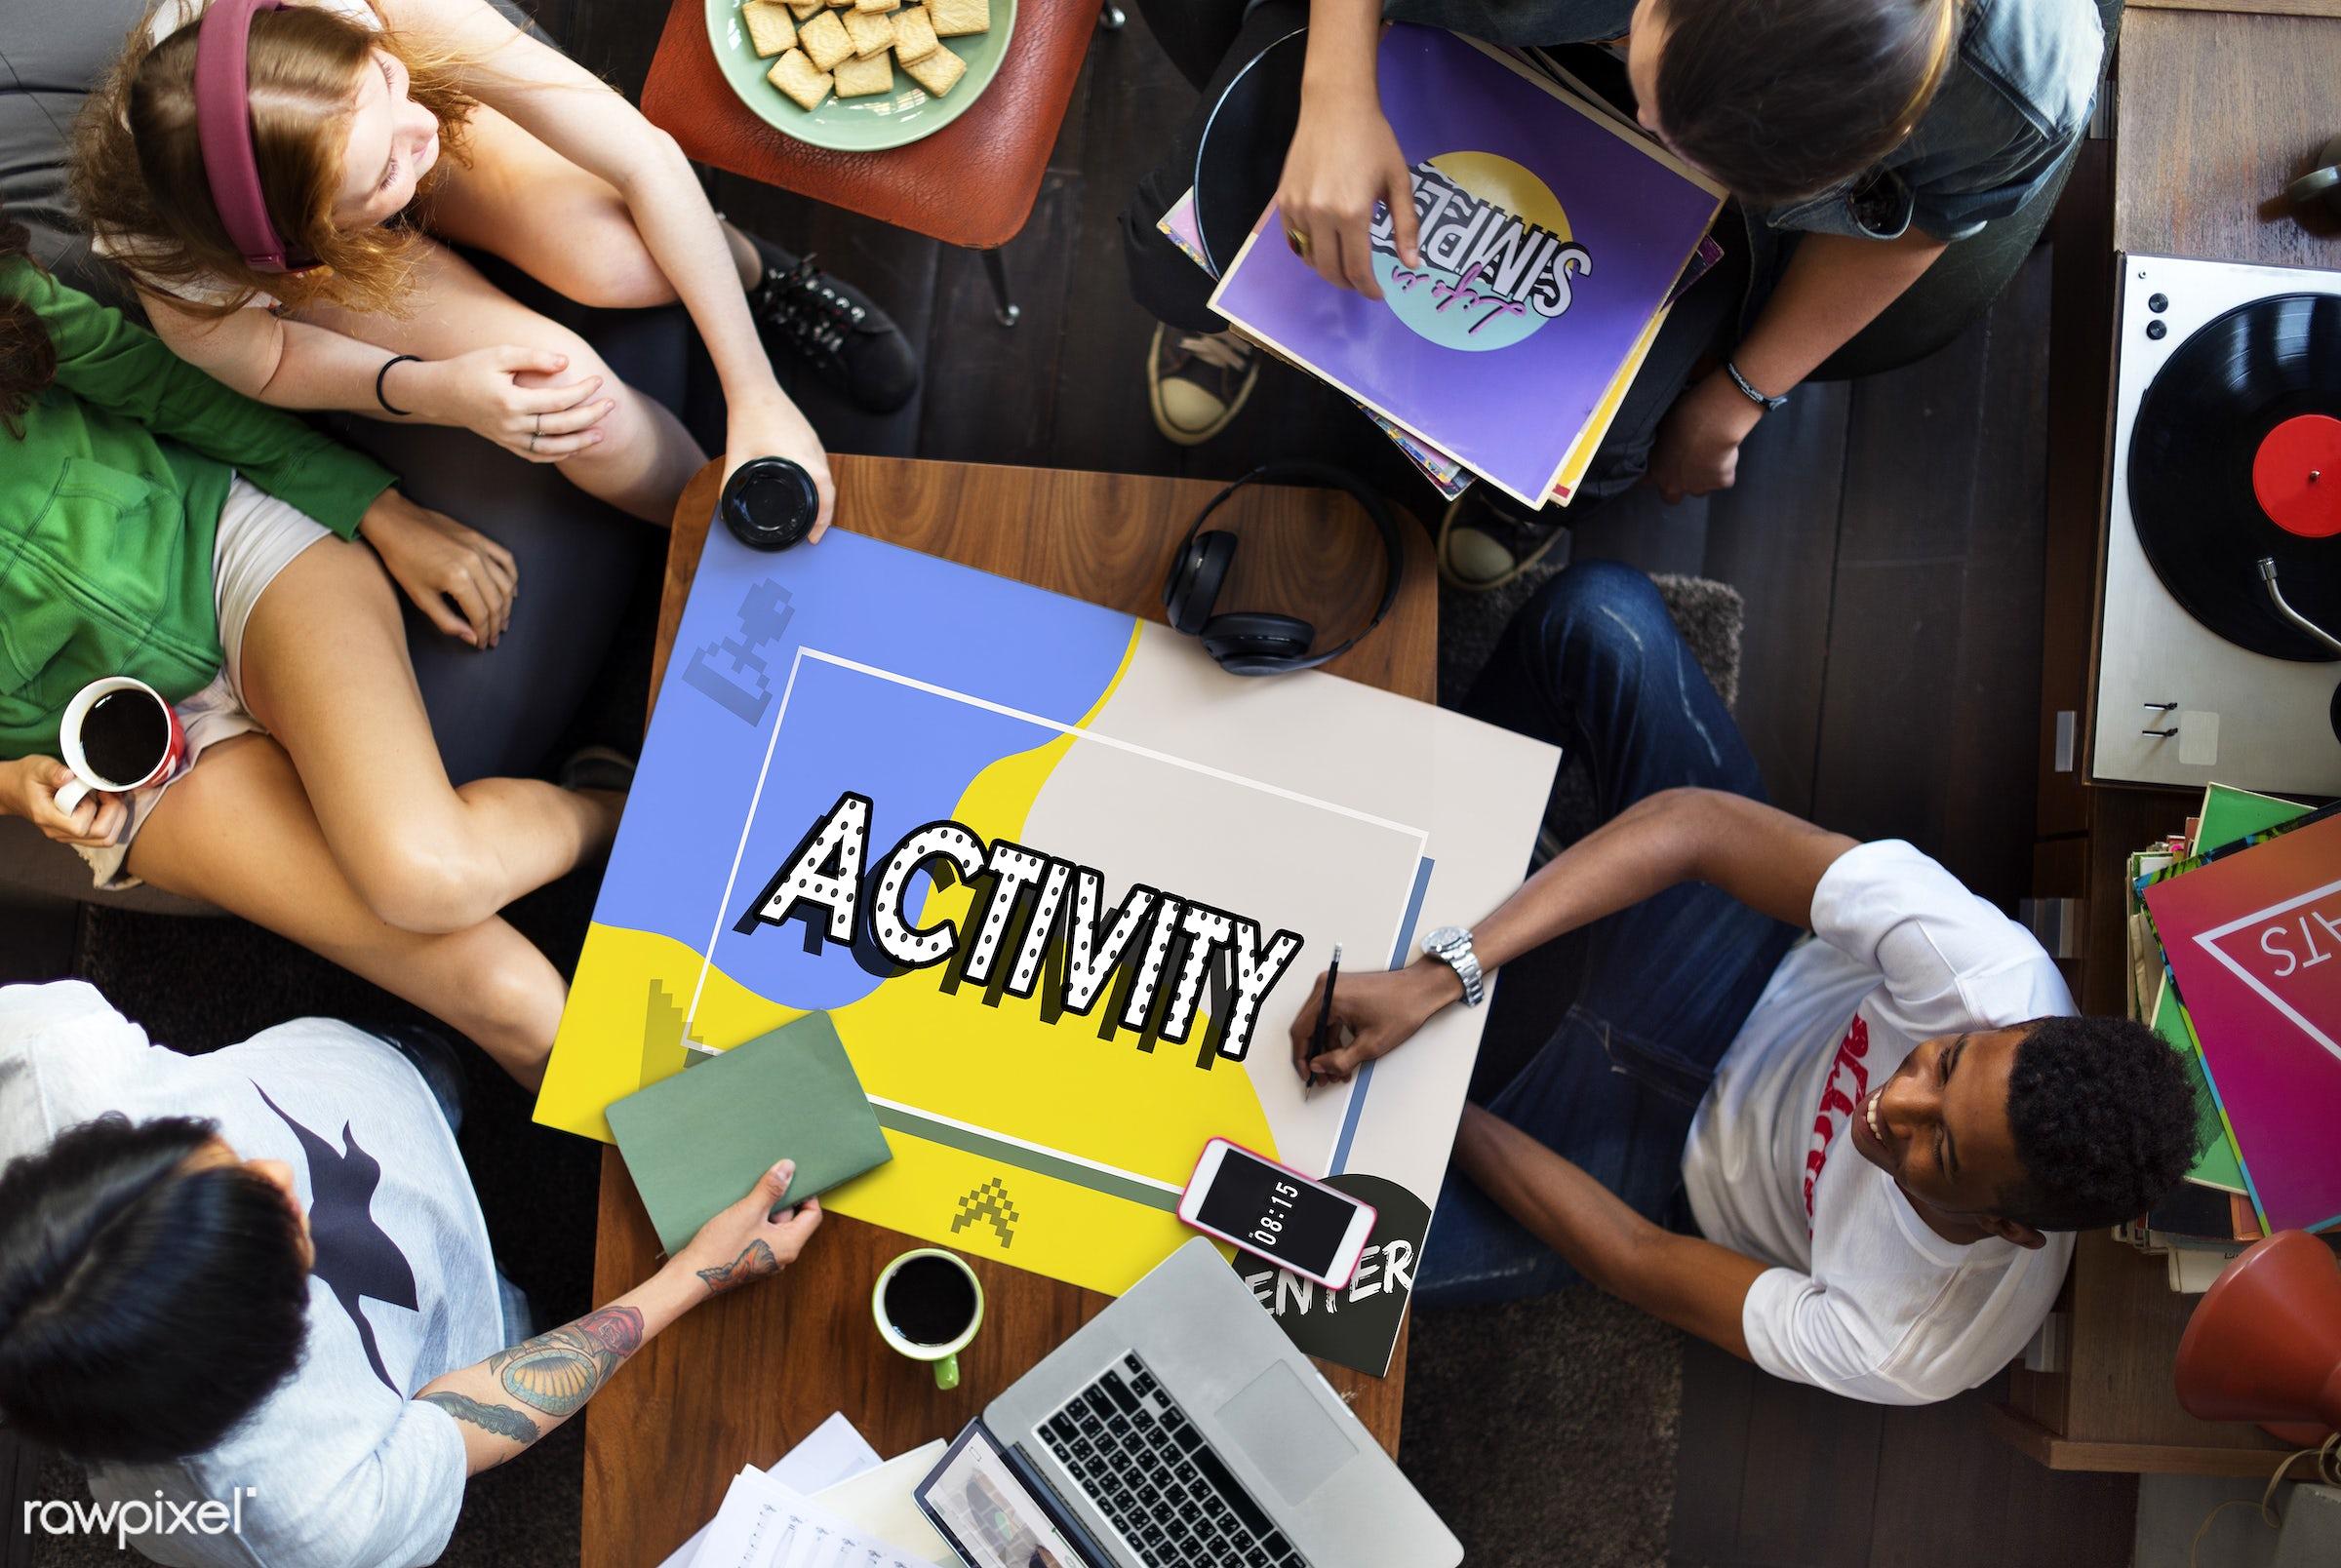 activity, addiction, african descent, asian, caucasian, console, control, controller, dependency, diversity, enjoyment,...